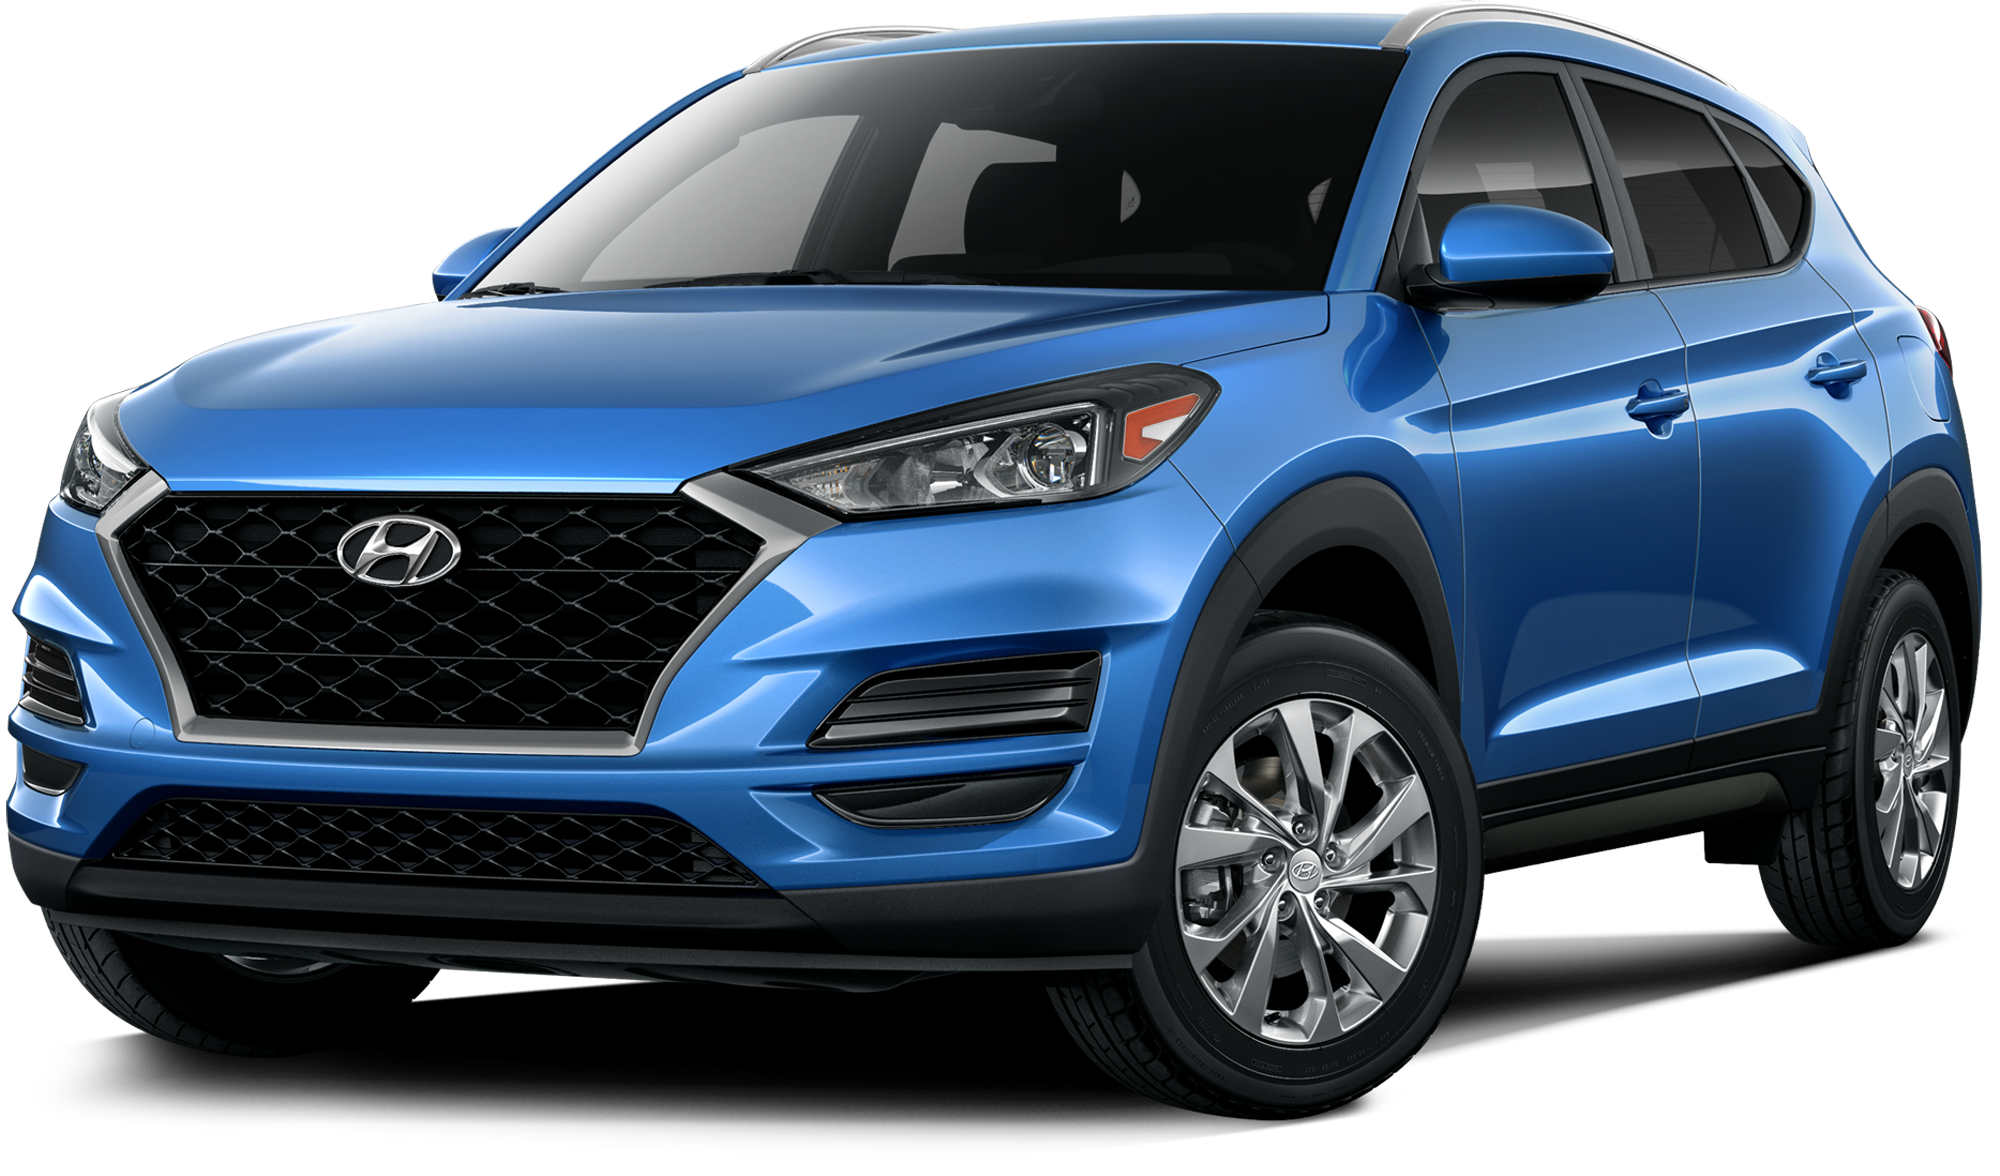 2021 Hyundai Tucson SUV Value